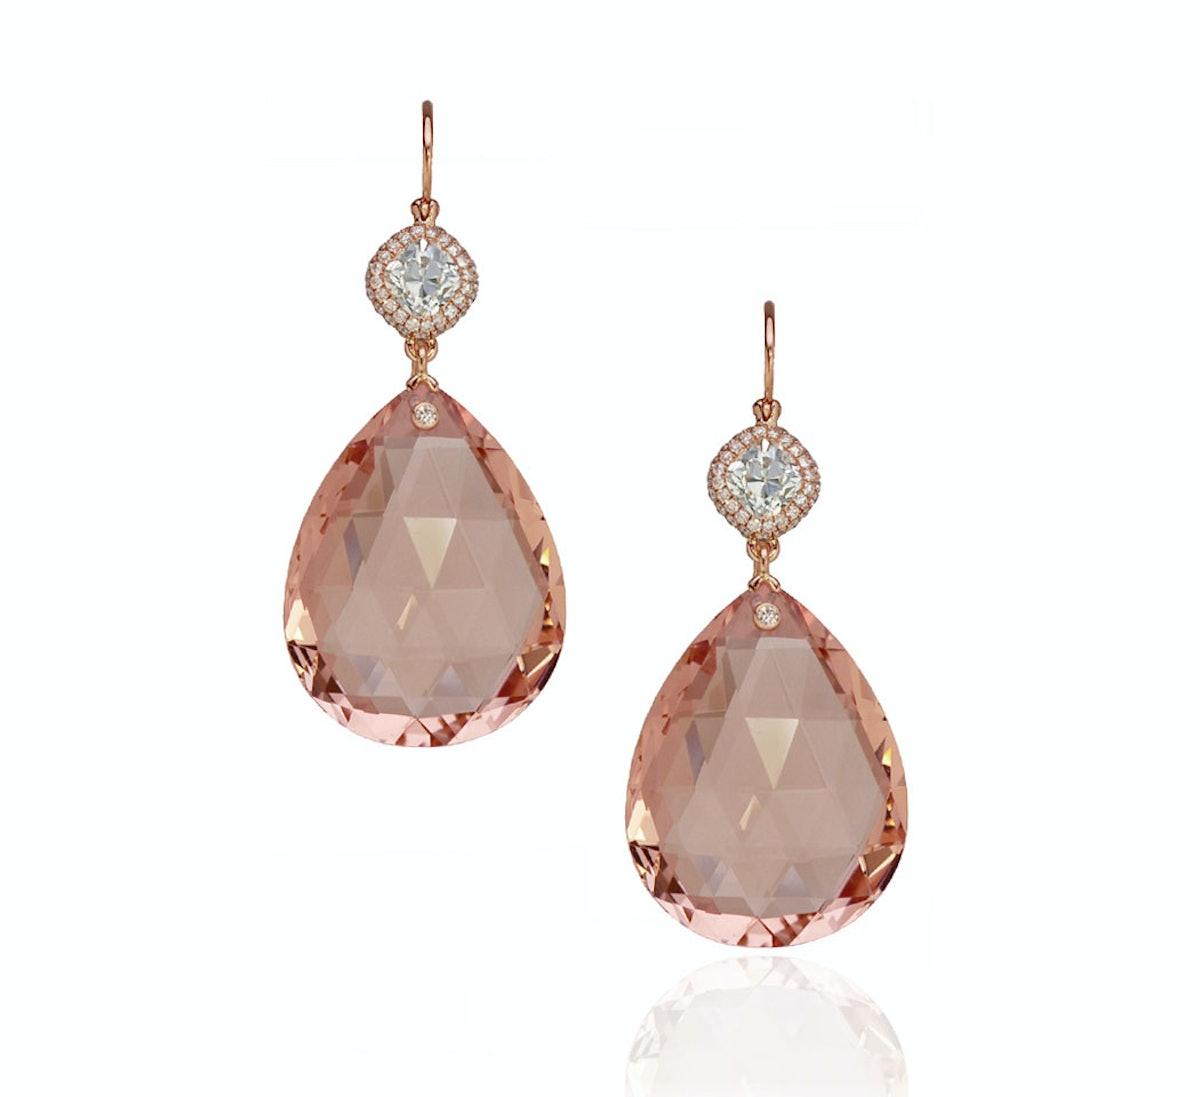 Stephen Russell earrings